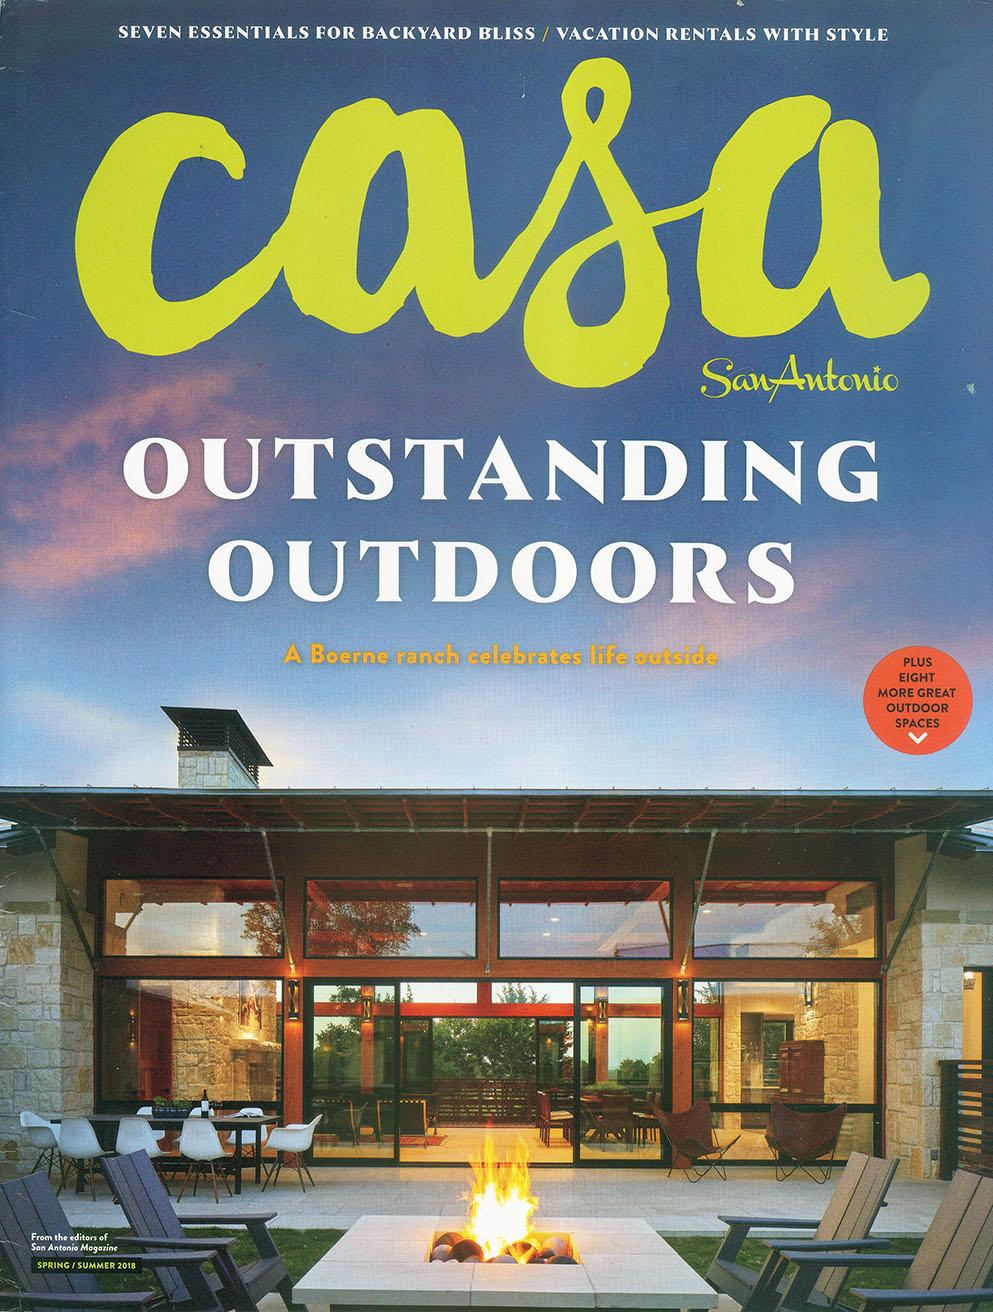 DuBois+Casa+Magazine+San+Antonio+Residence.jpg